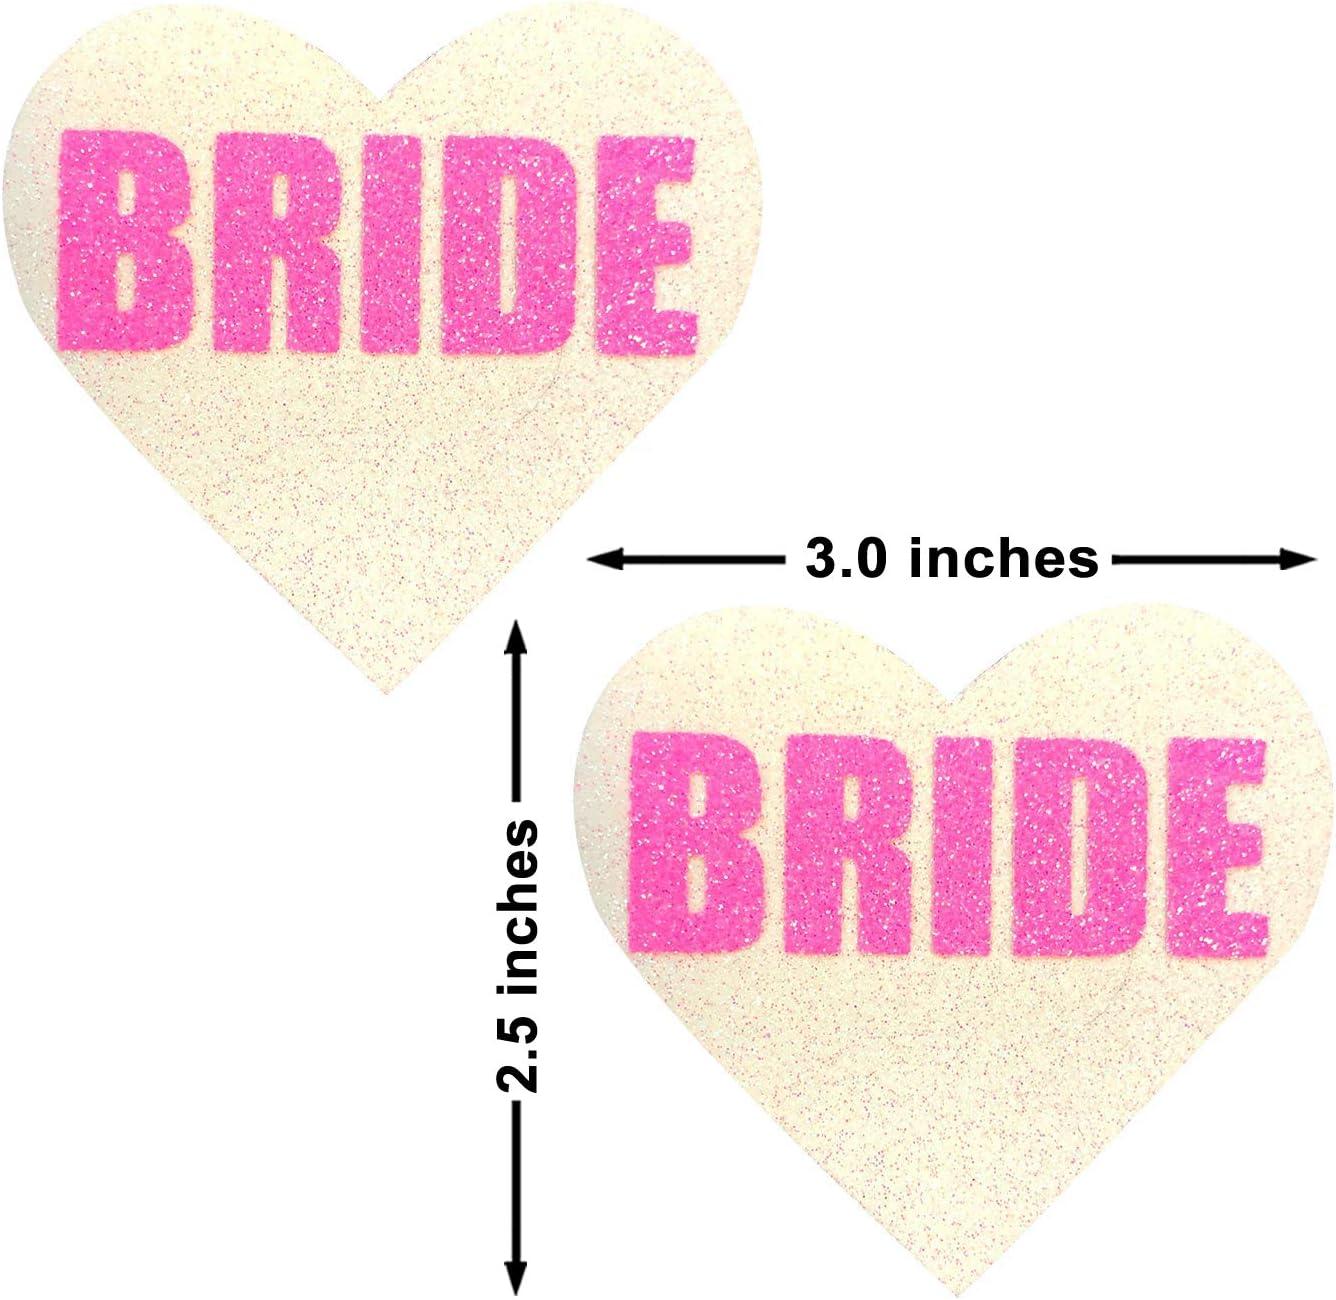 Neva Nude Bride NEON UV Pink White Glitter I Heart U Nipztix Pasties Nipple Cover